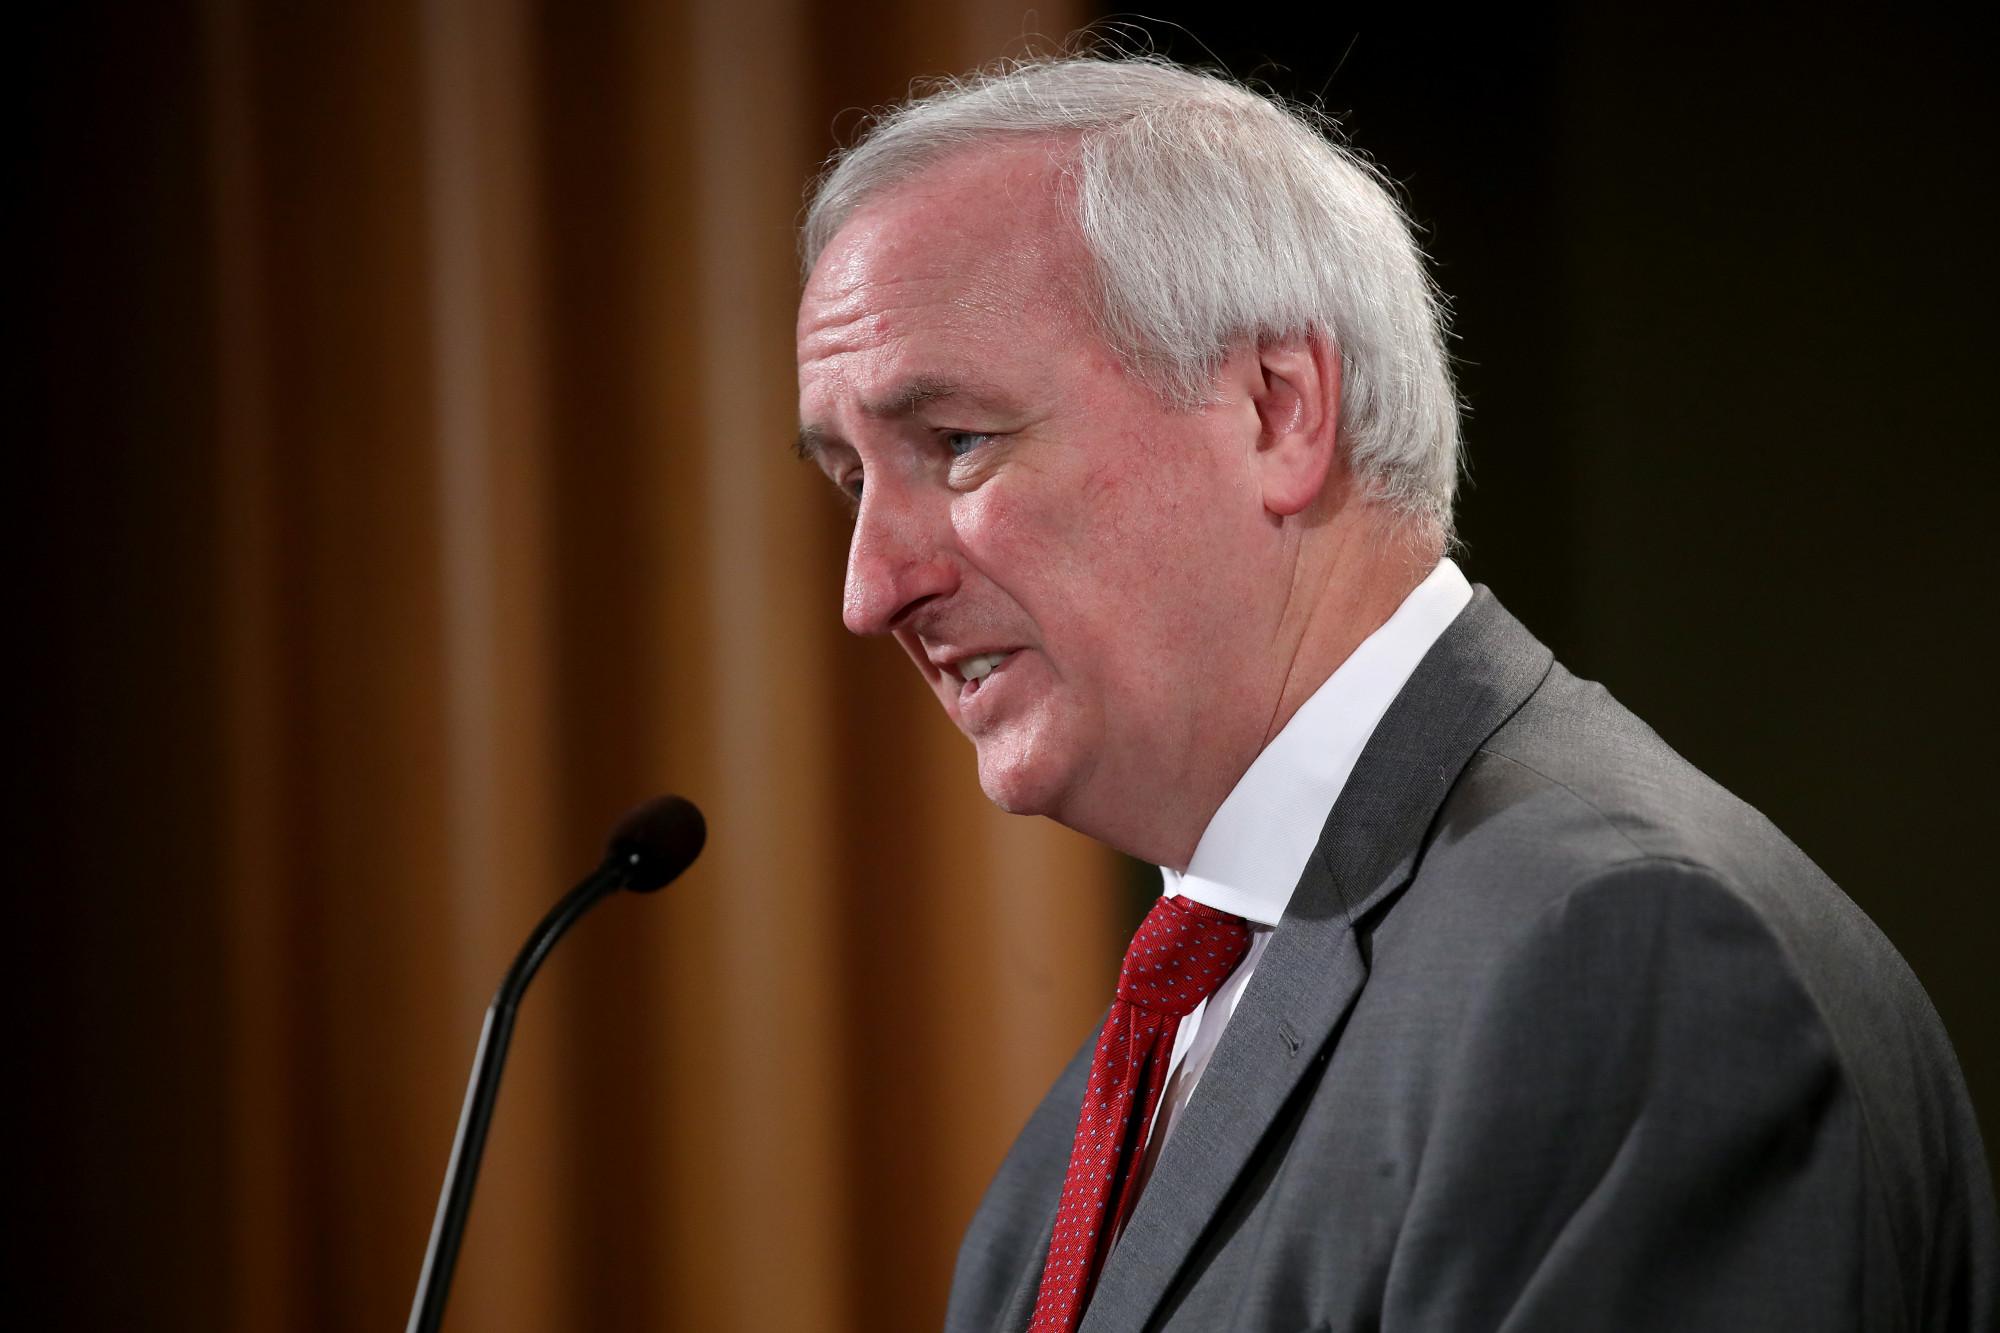 Deputy Attorney General Jeffrey Rosen